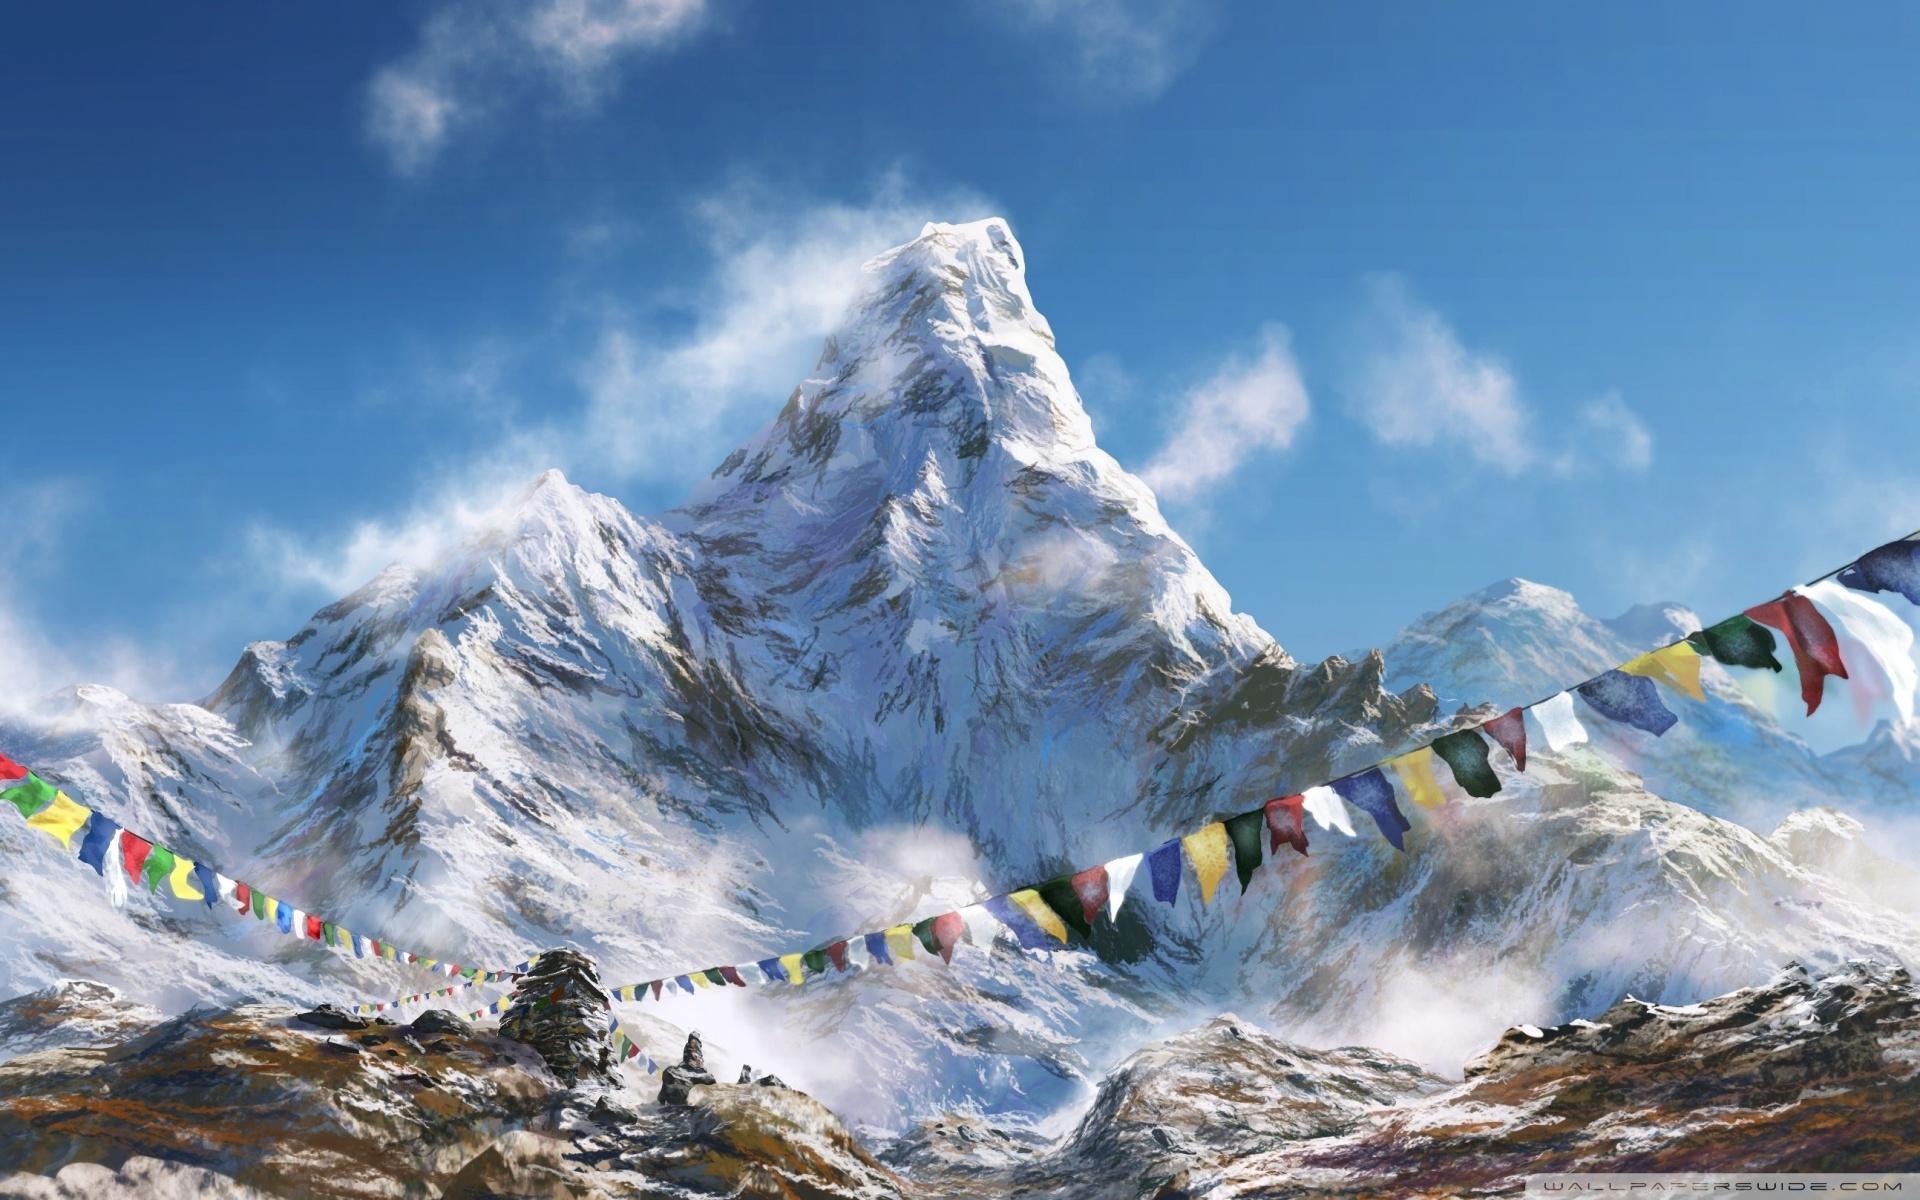 Wallpapers of himalayas wallpapersafari - Himalaya pictures wallpaper ...